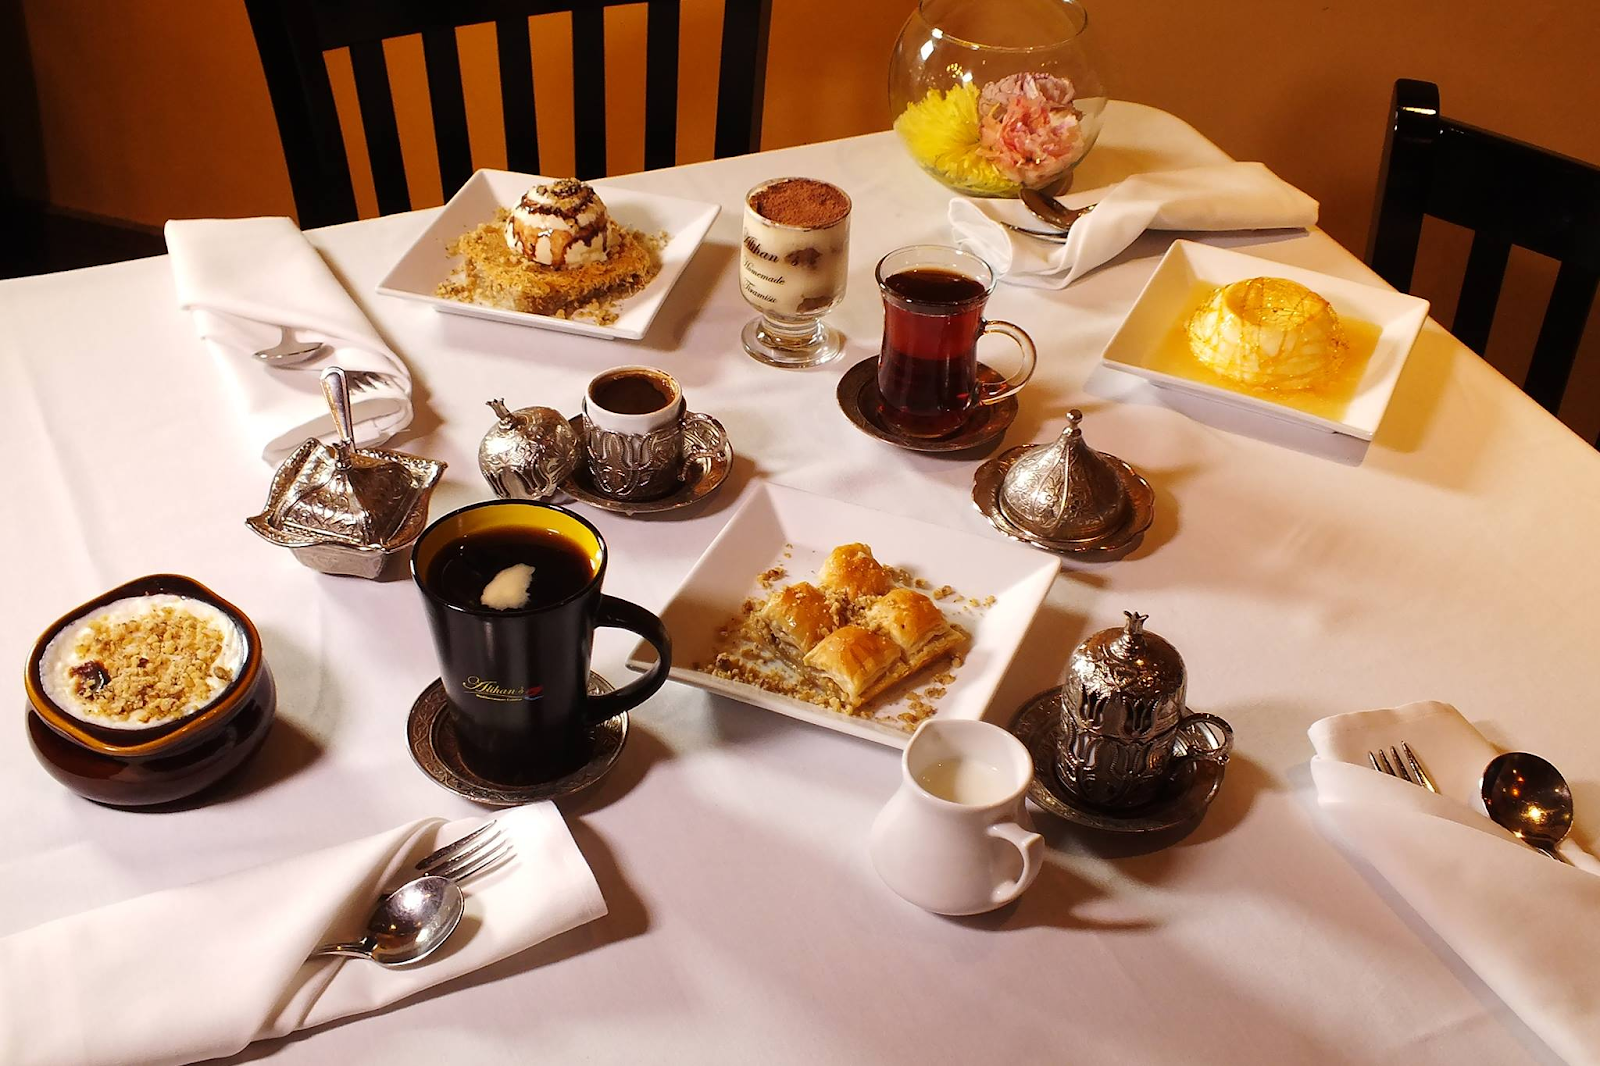 tea, coffee, and desserts